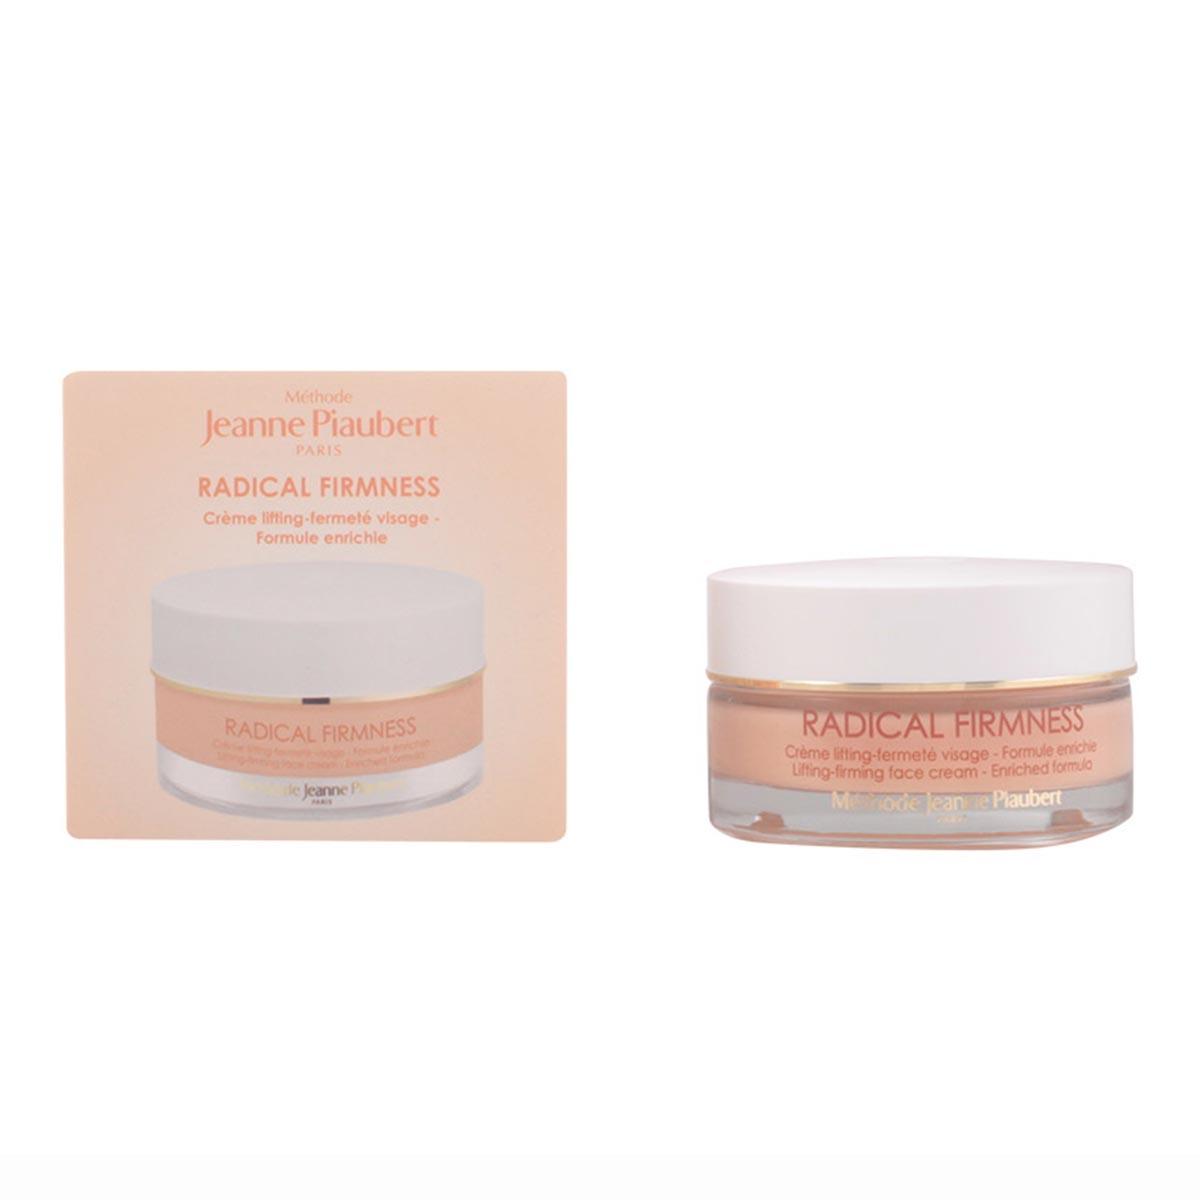 Jeanne piaubert radical firmness face cream 50ml